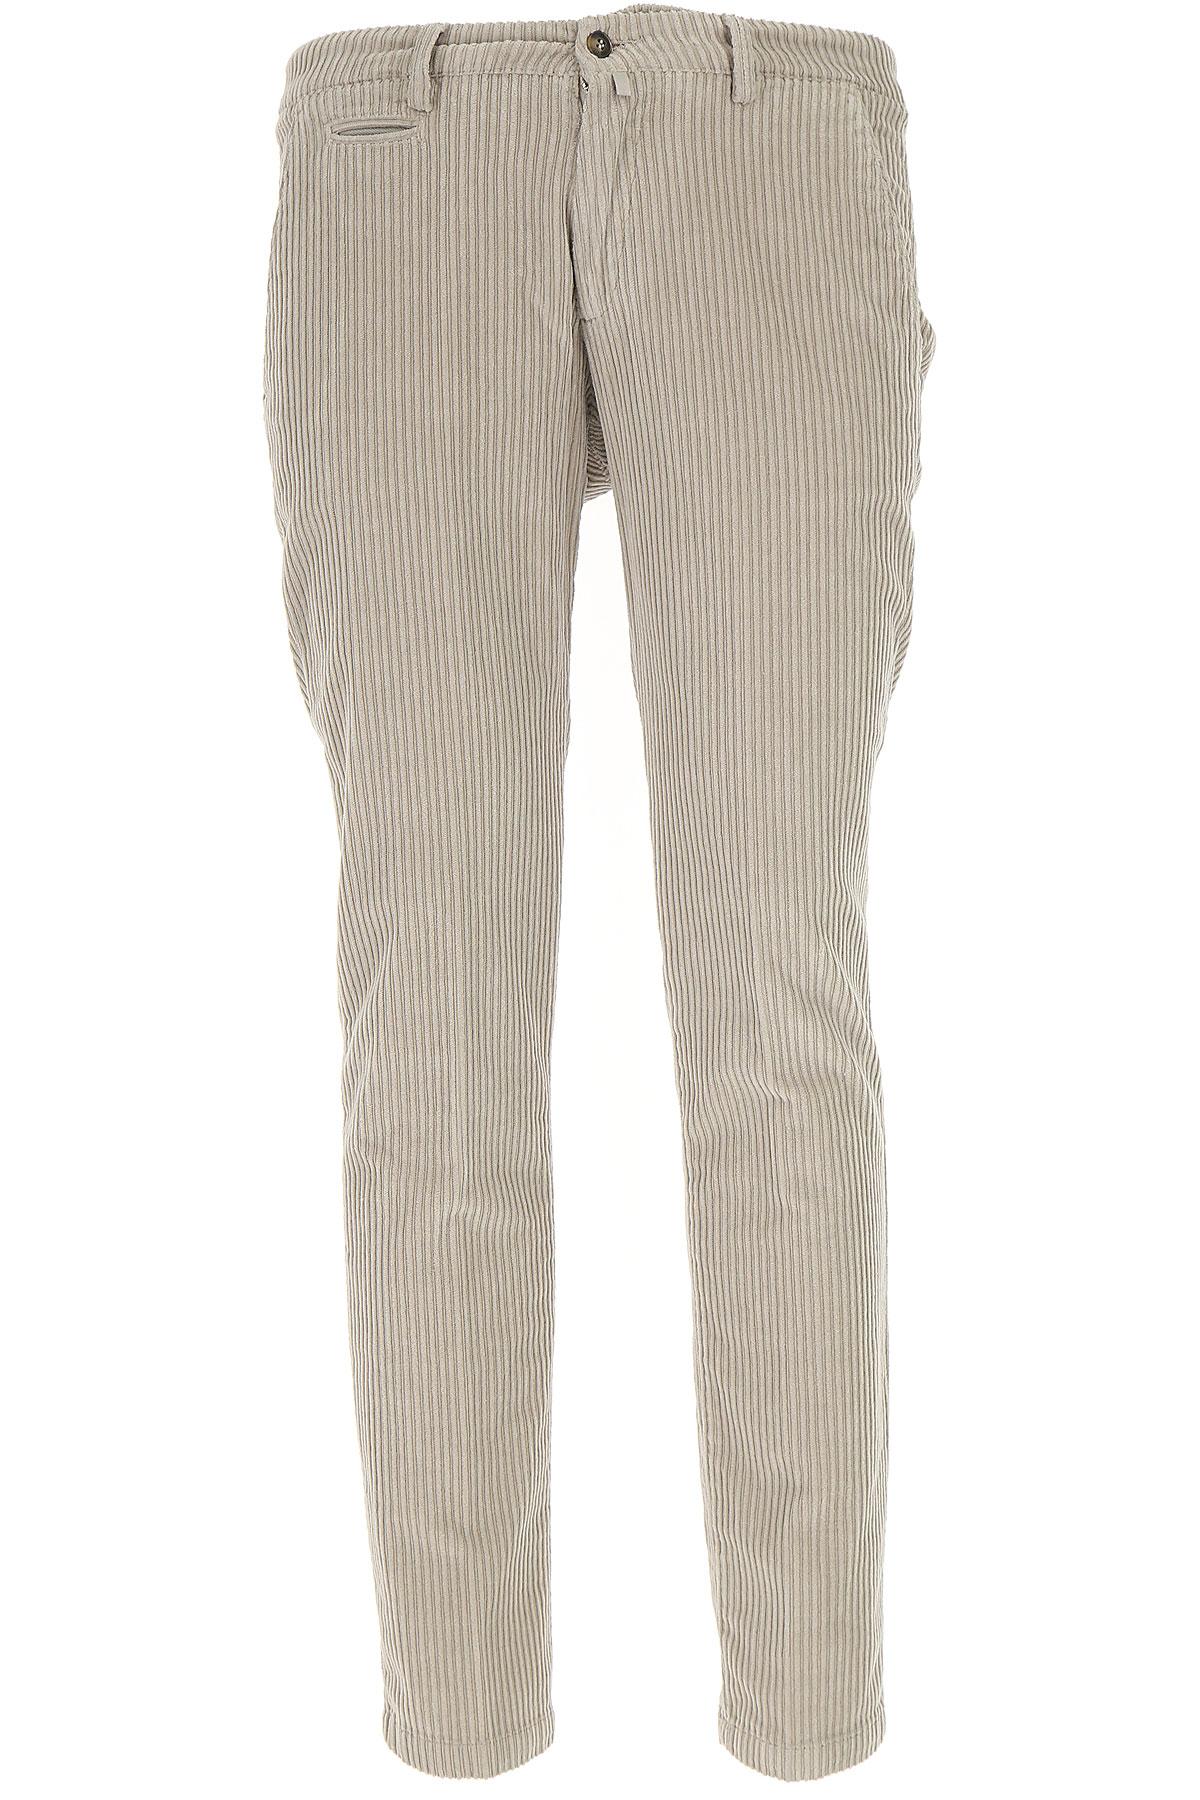 Image of Briglia Pants for Men, Ecru, Cotton, 2017, US 30 - EU 44 US 32 - EU 46 US 34 - EU 48 US 36 - EU 50 US 38 - EU 52